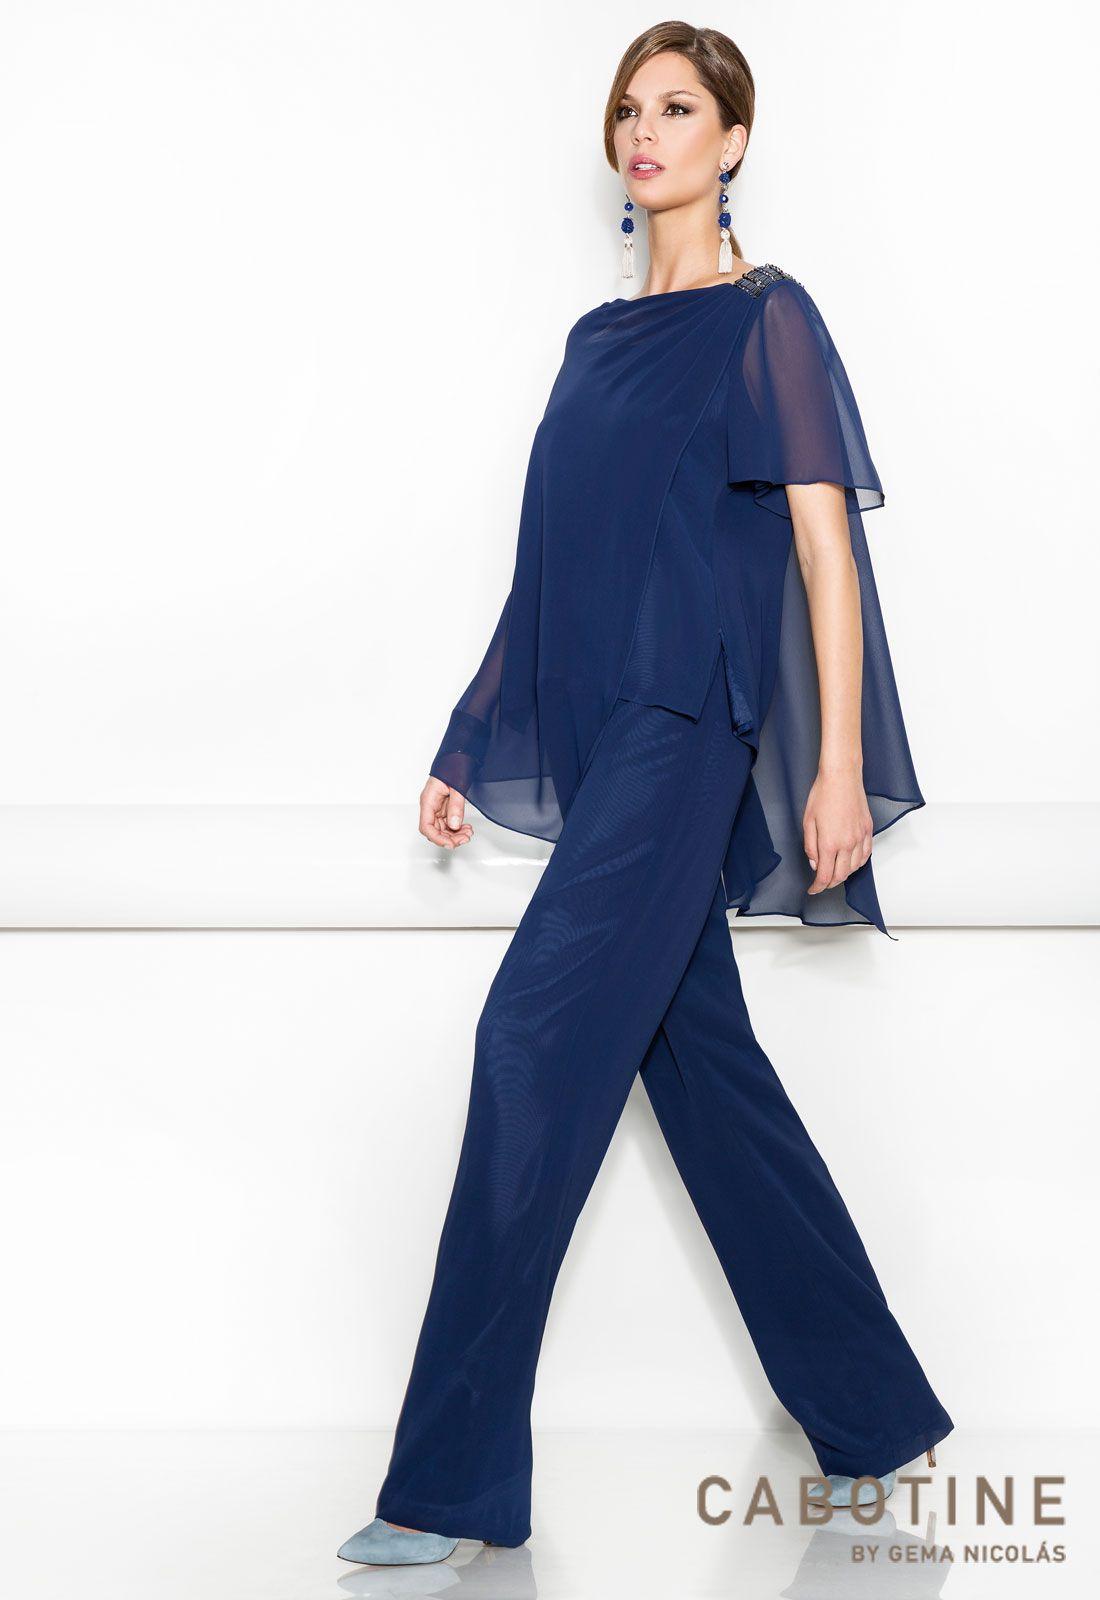 47+ Conjuntos de pantalon para bodas 2019 trends